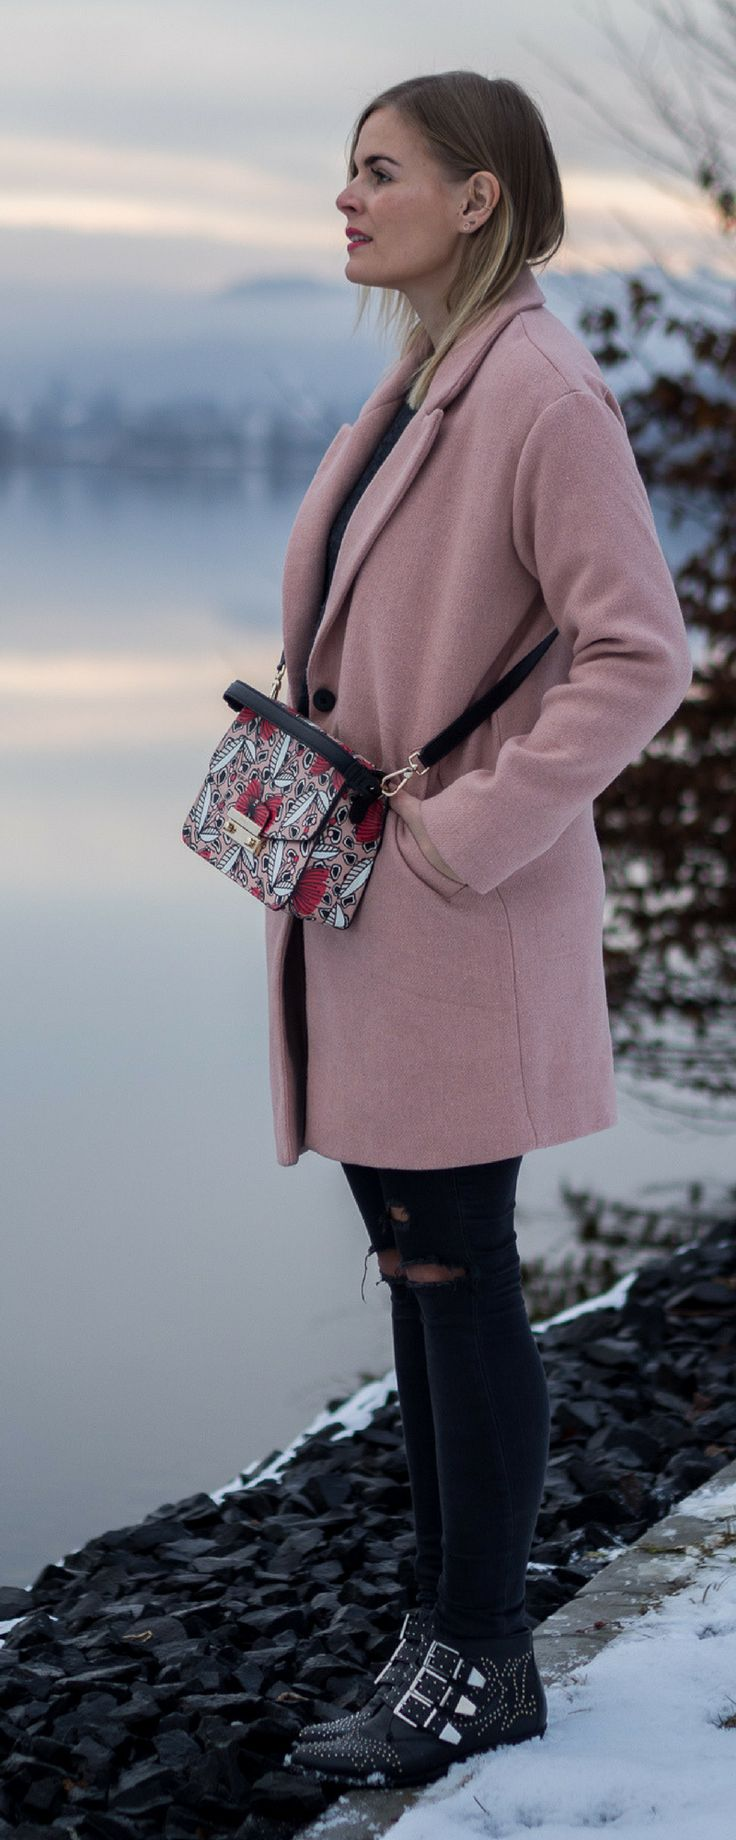 Street Style, Wintermantel, Furla Tasche, Boots, Fashion, Outfit, Blogger, Damen, Wolle